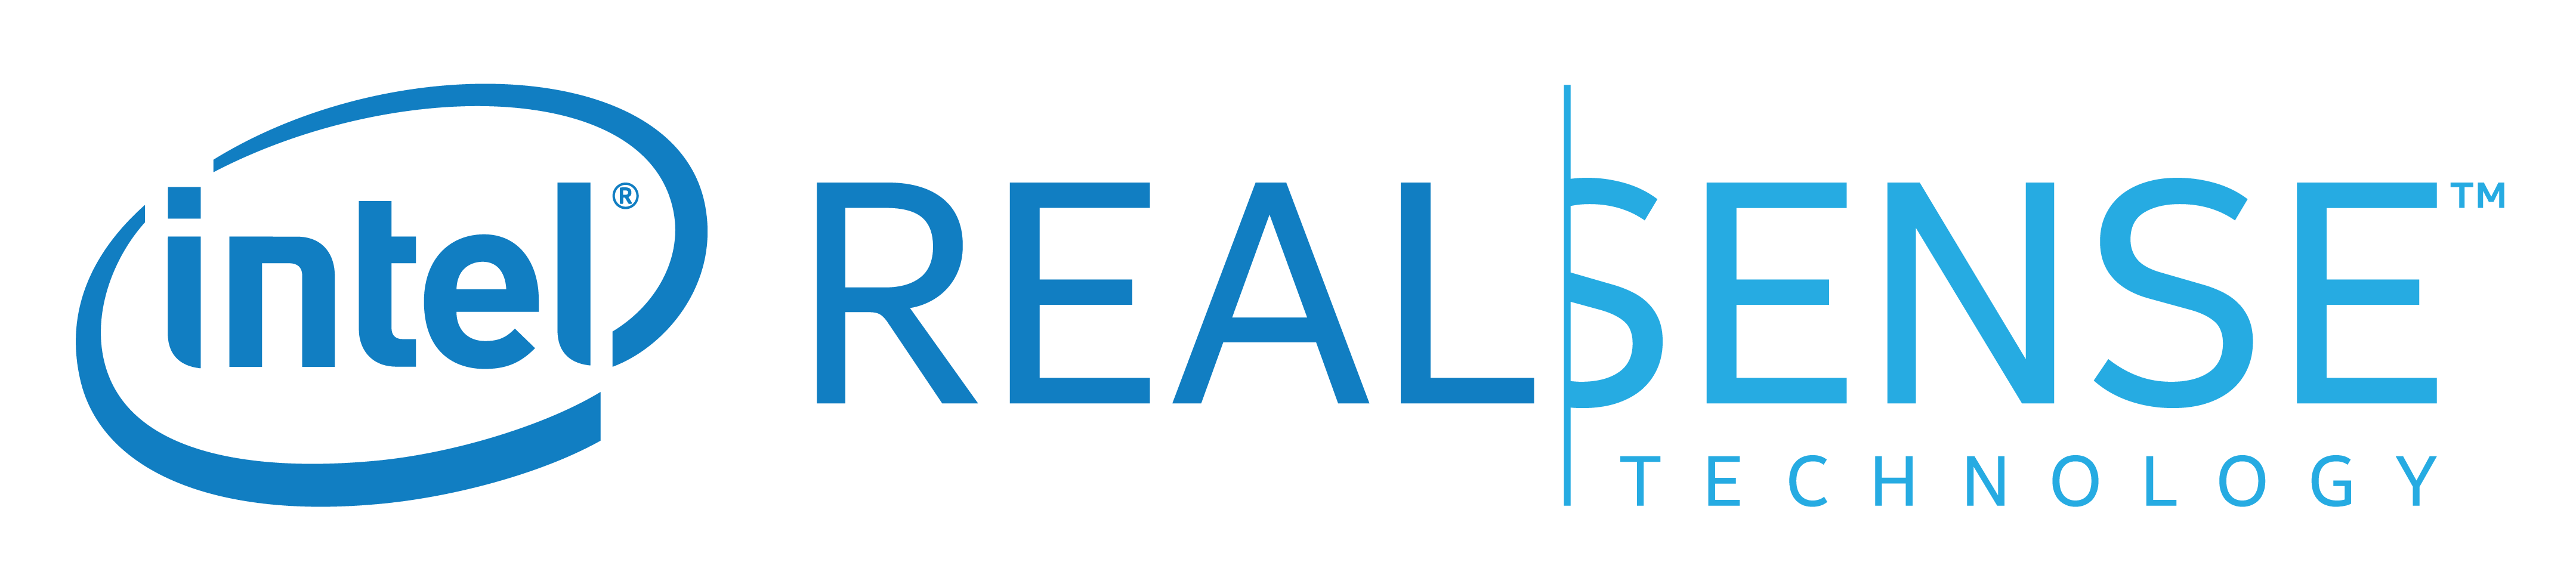 Intel_RealSense_Logo_ColorLEDZVepQTu1sn